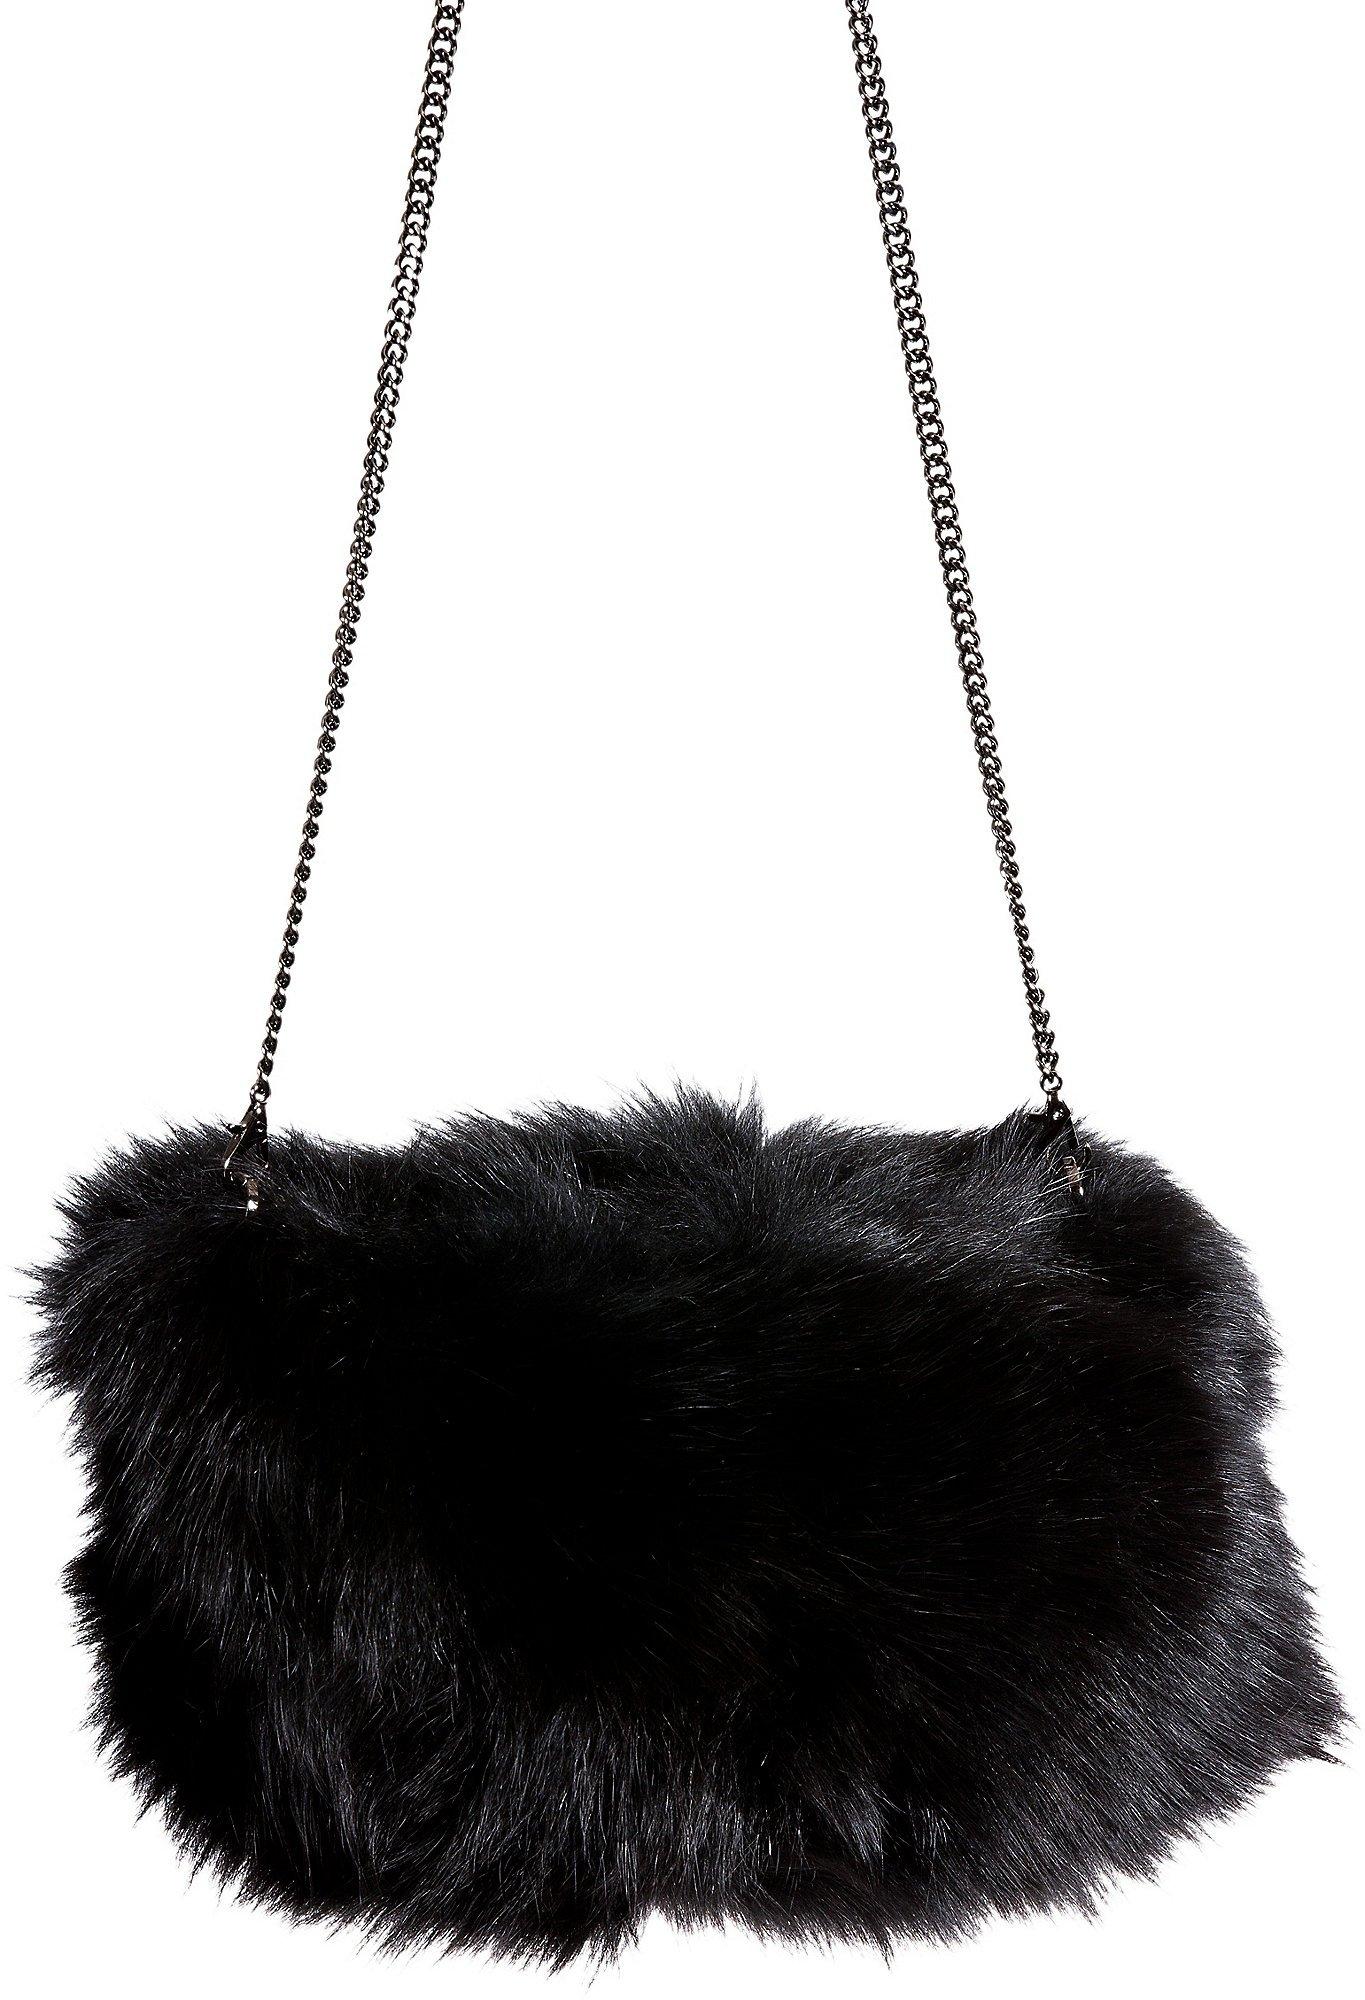 Fox Fur Muff Clutch Shoulder Bag by Overland Sheepskin Co